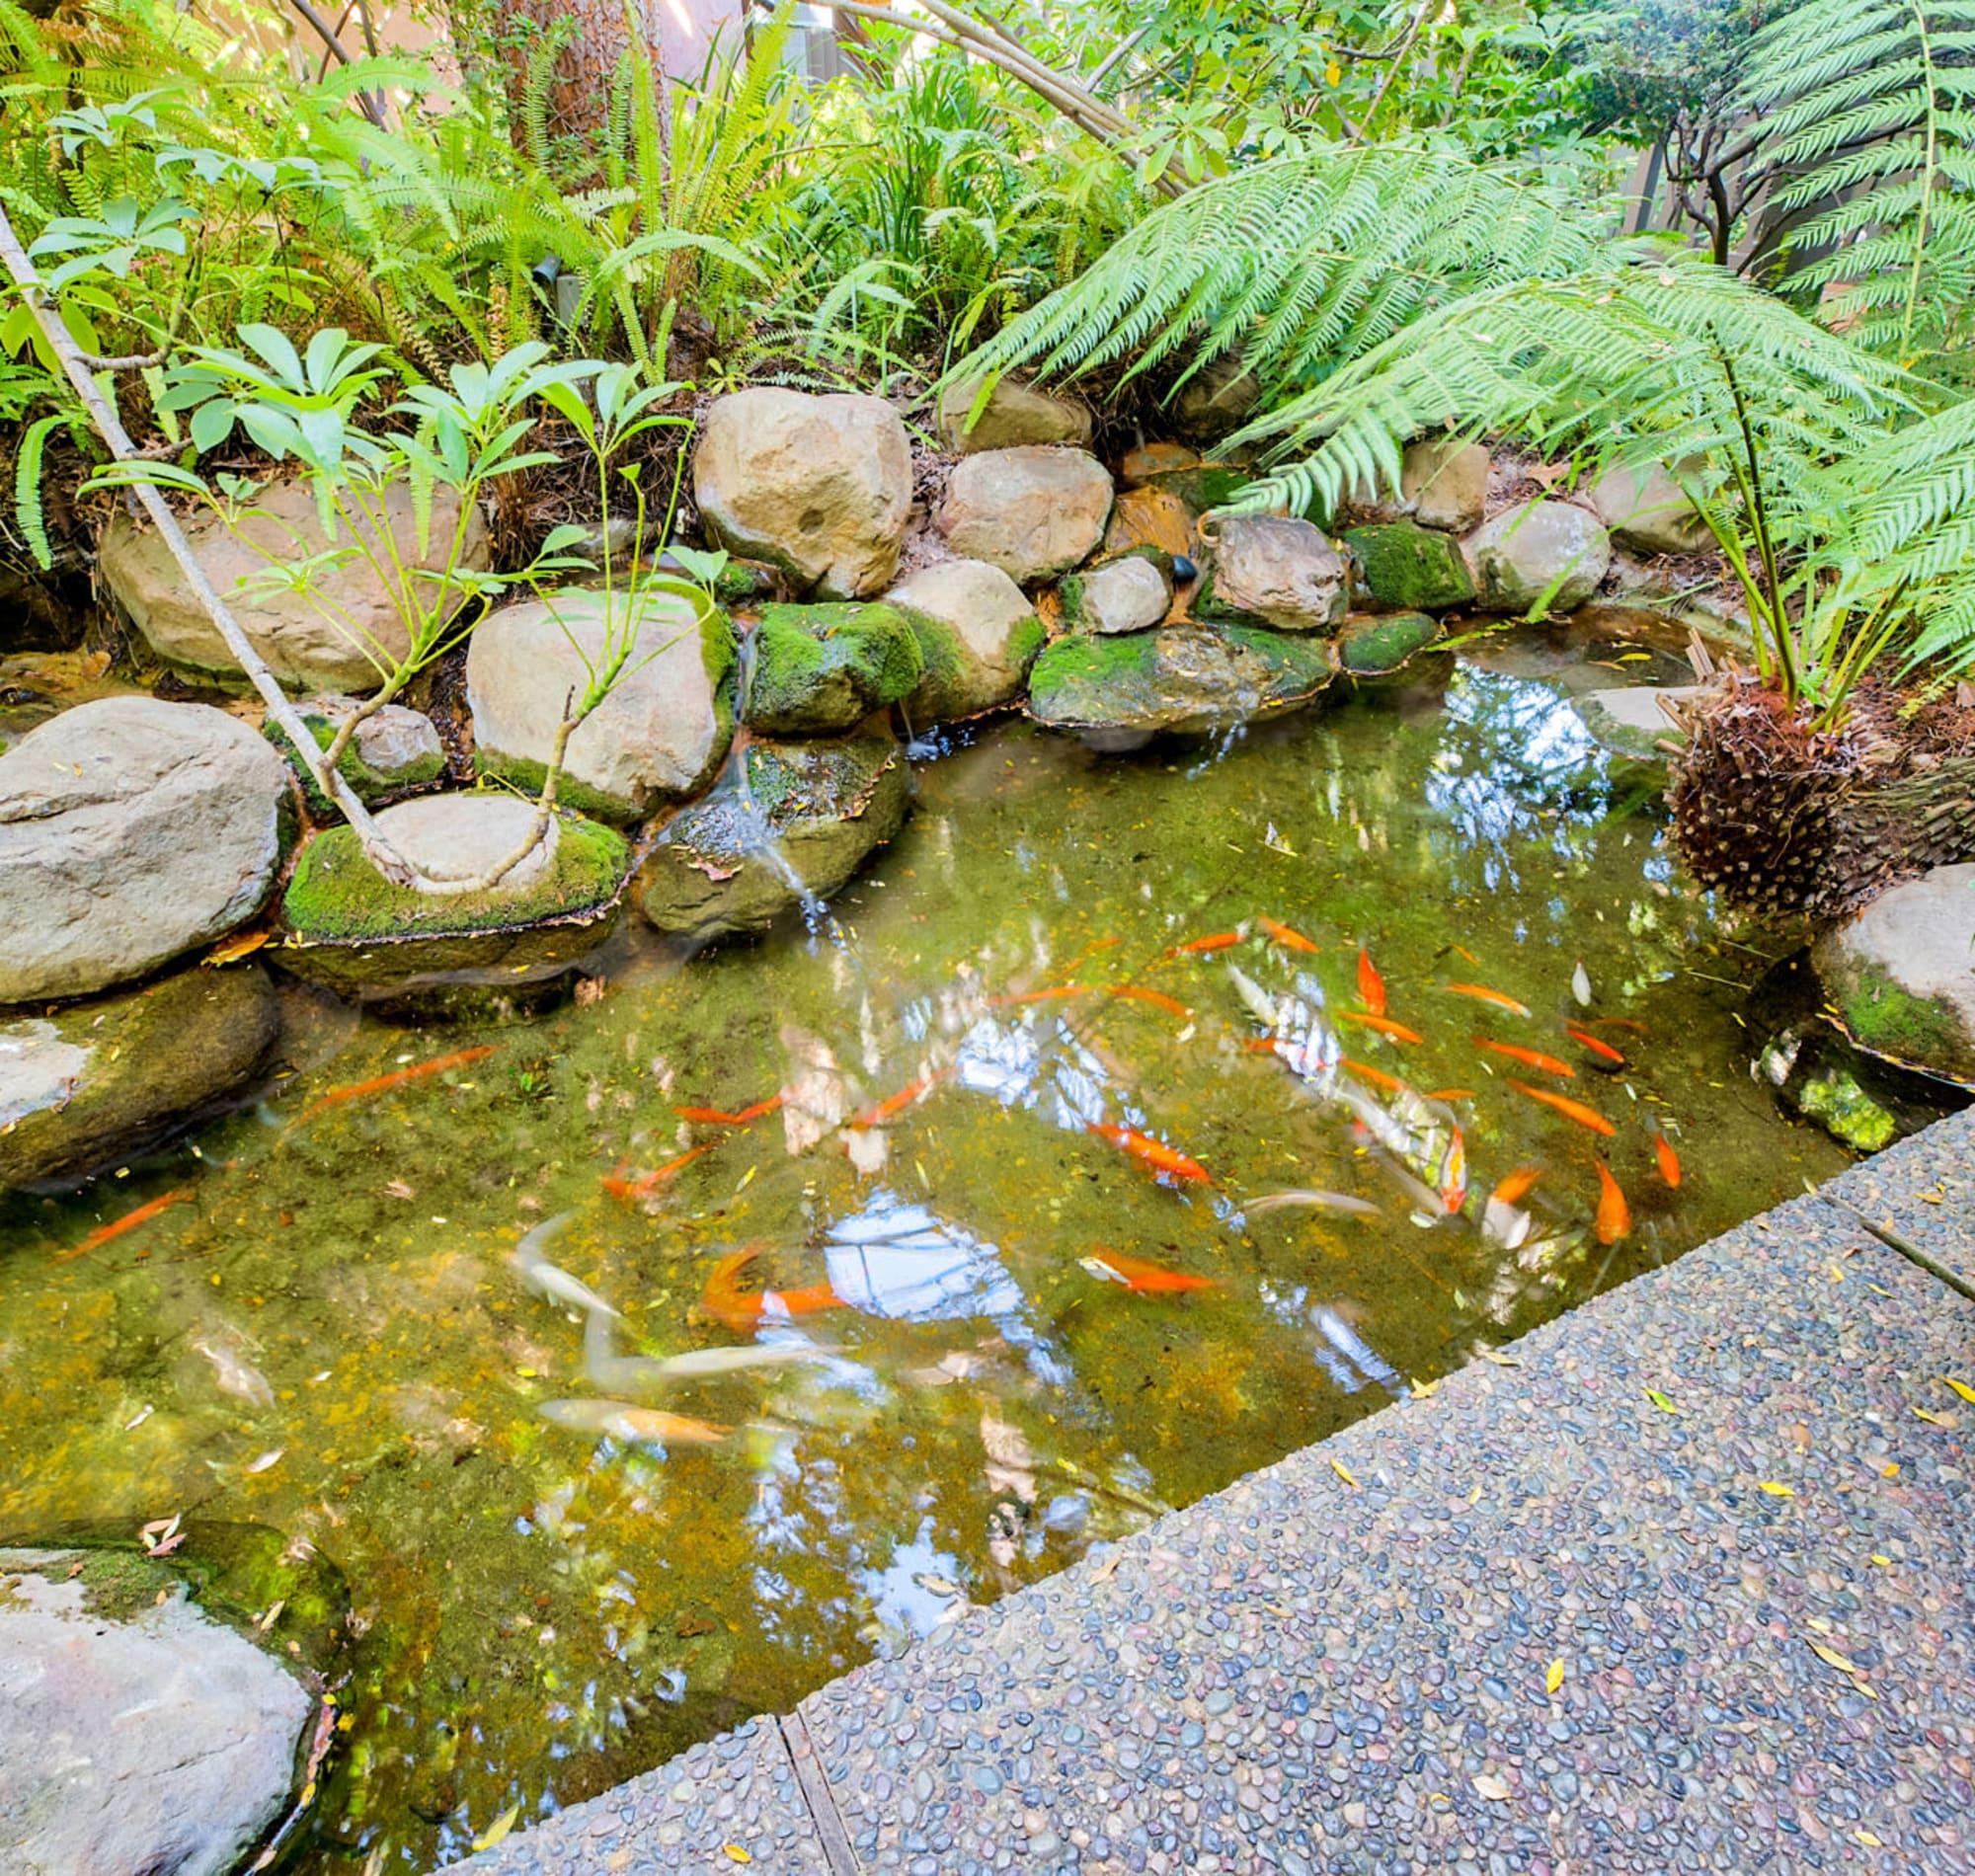 Koi thriving in a pond at Casa Granada in Los Angeles, California